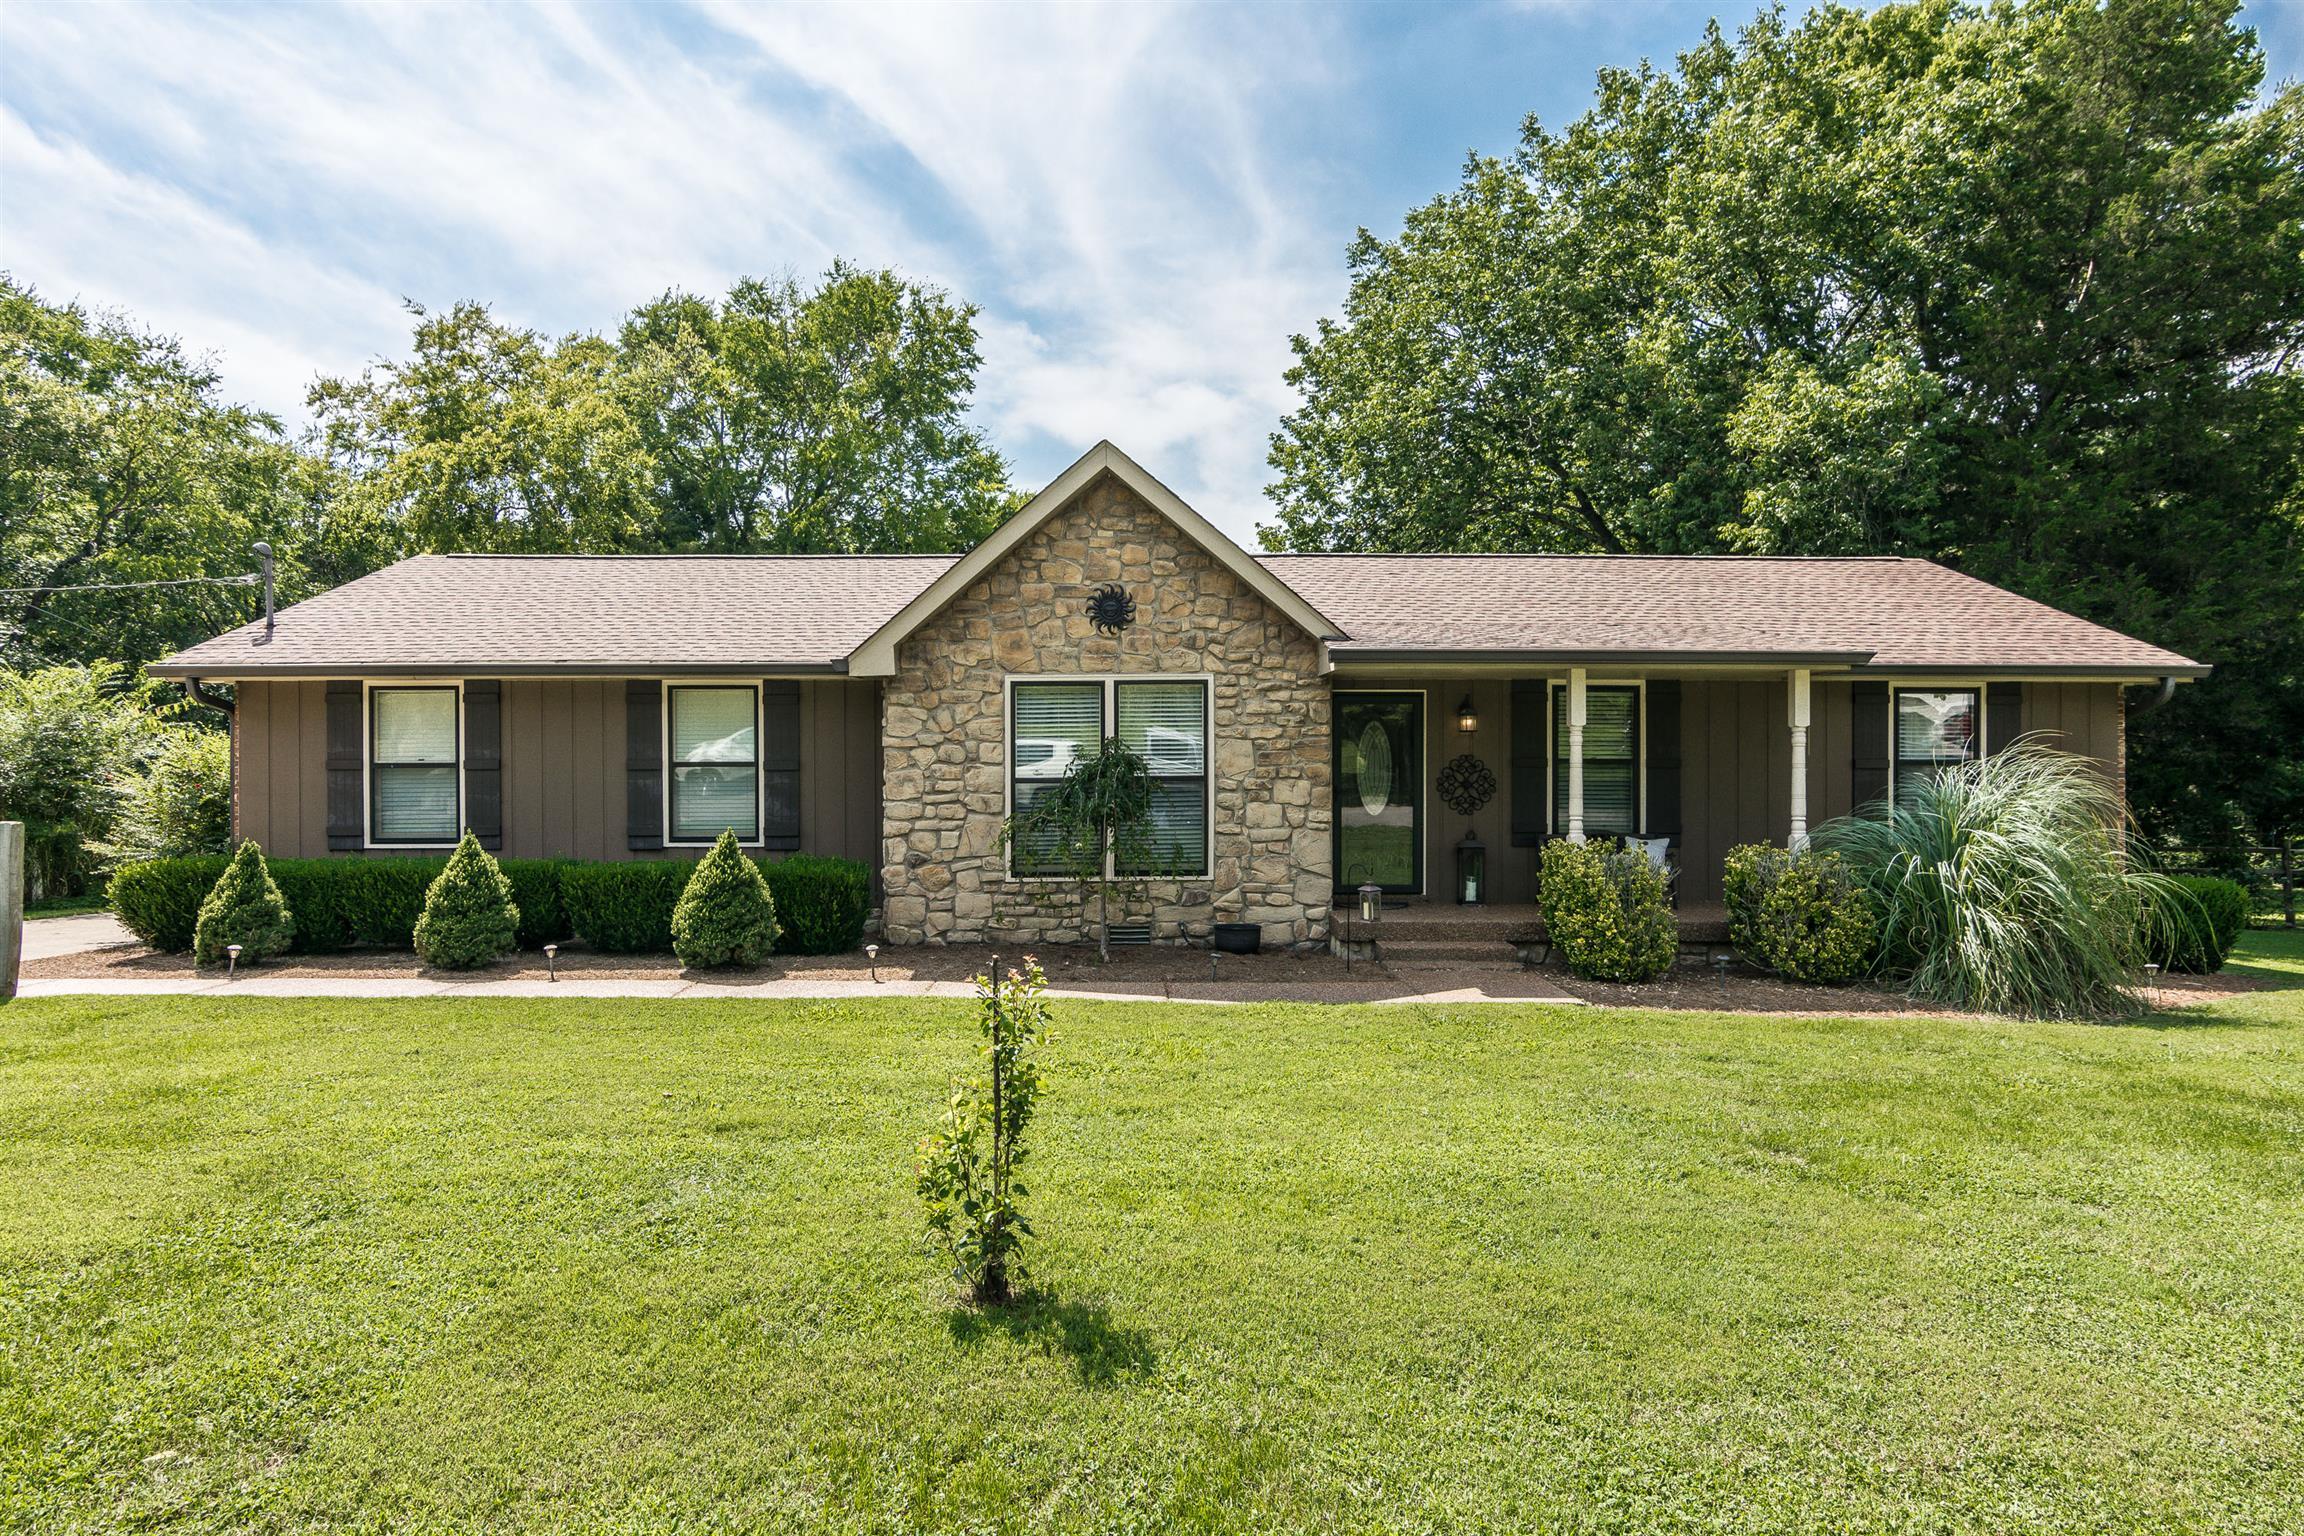 106 Bent Creek Ct, Hendersonville, TN 37075 - Hendersonville, TN real estate listing